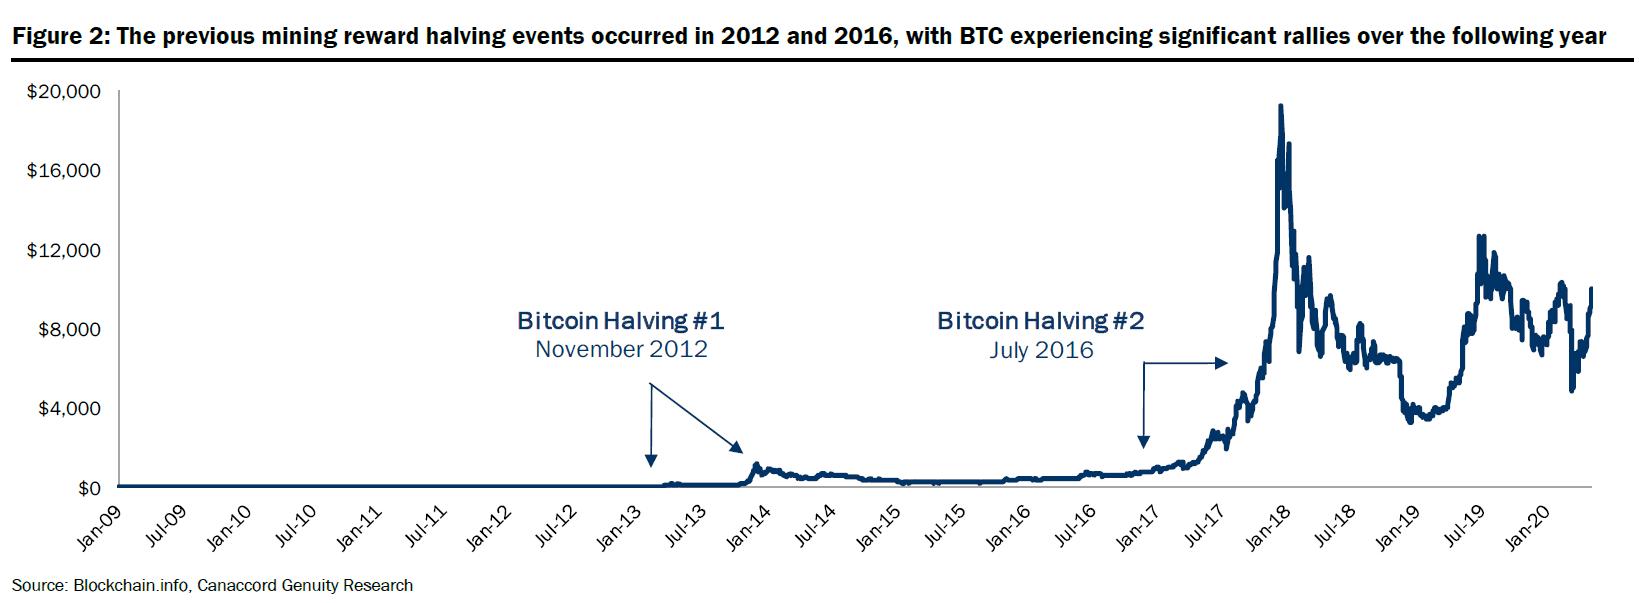 bitcoin halving event